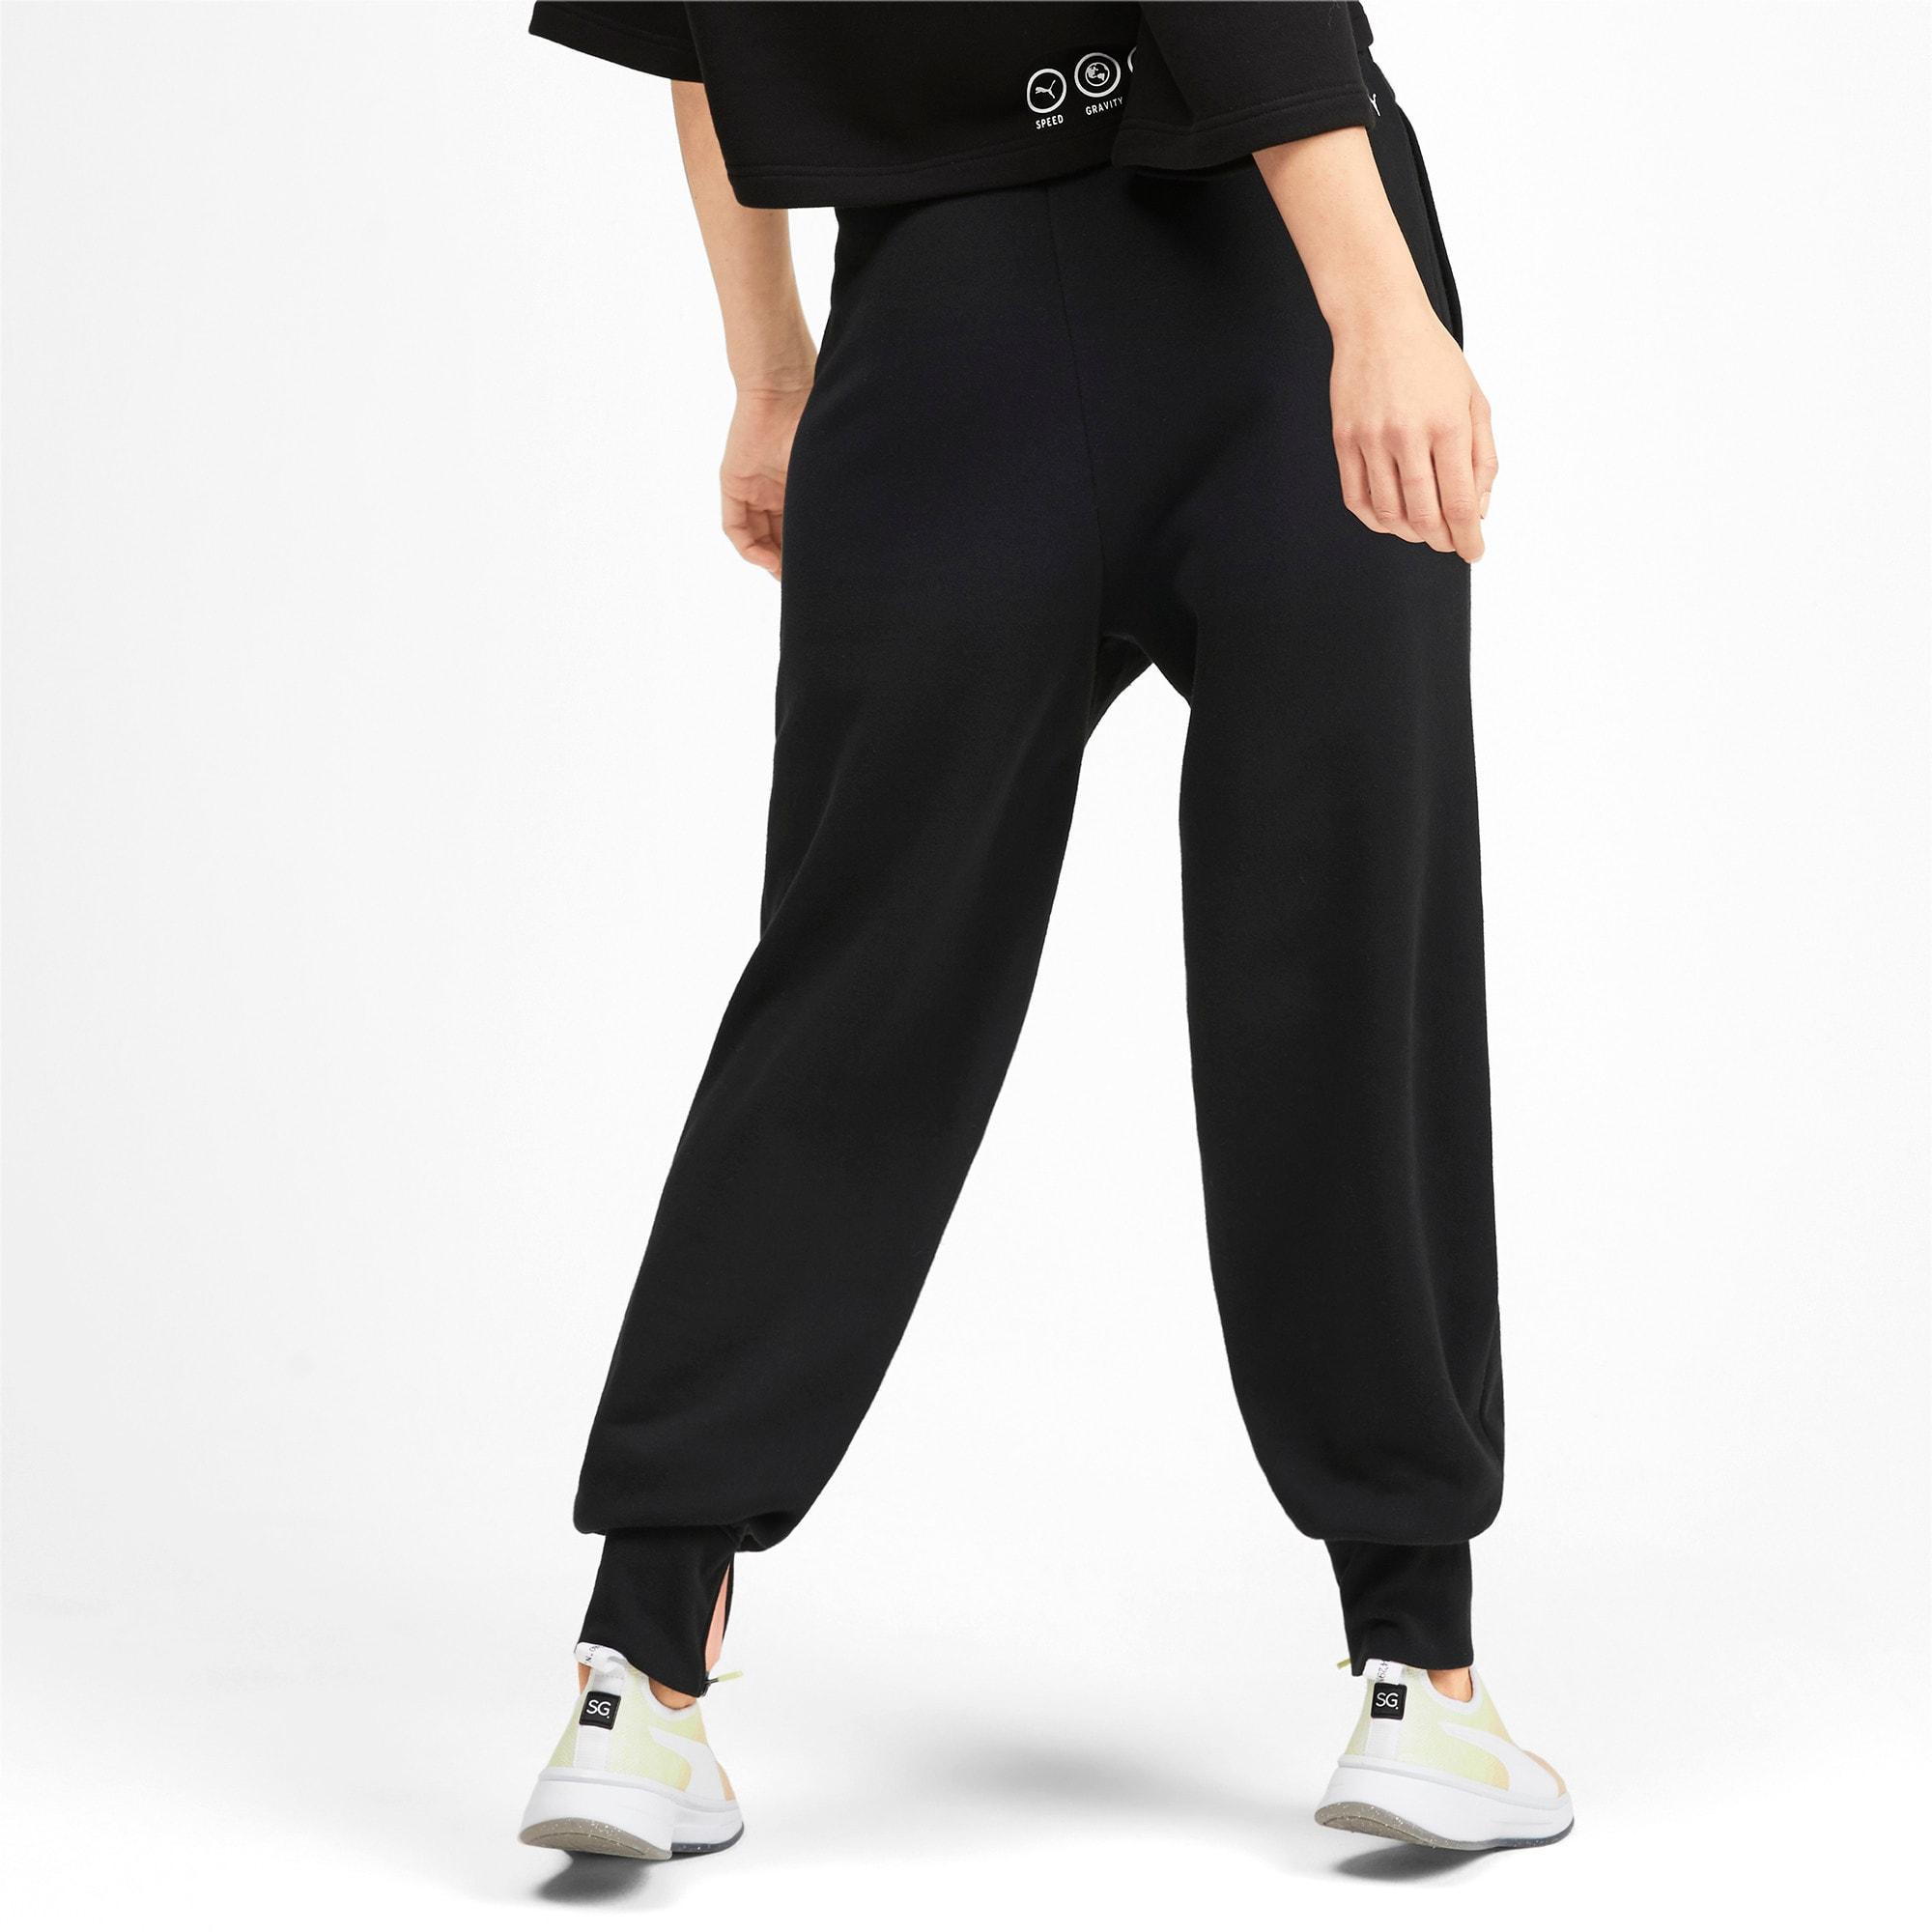 Thumbnail 2 of PUMA x SELENA GOMEZ Women's Sweatpants, Puma Black, medium-IND